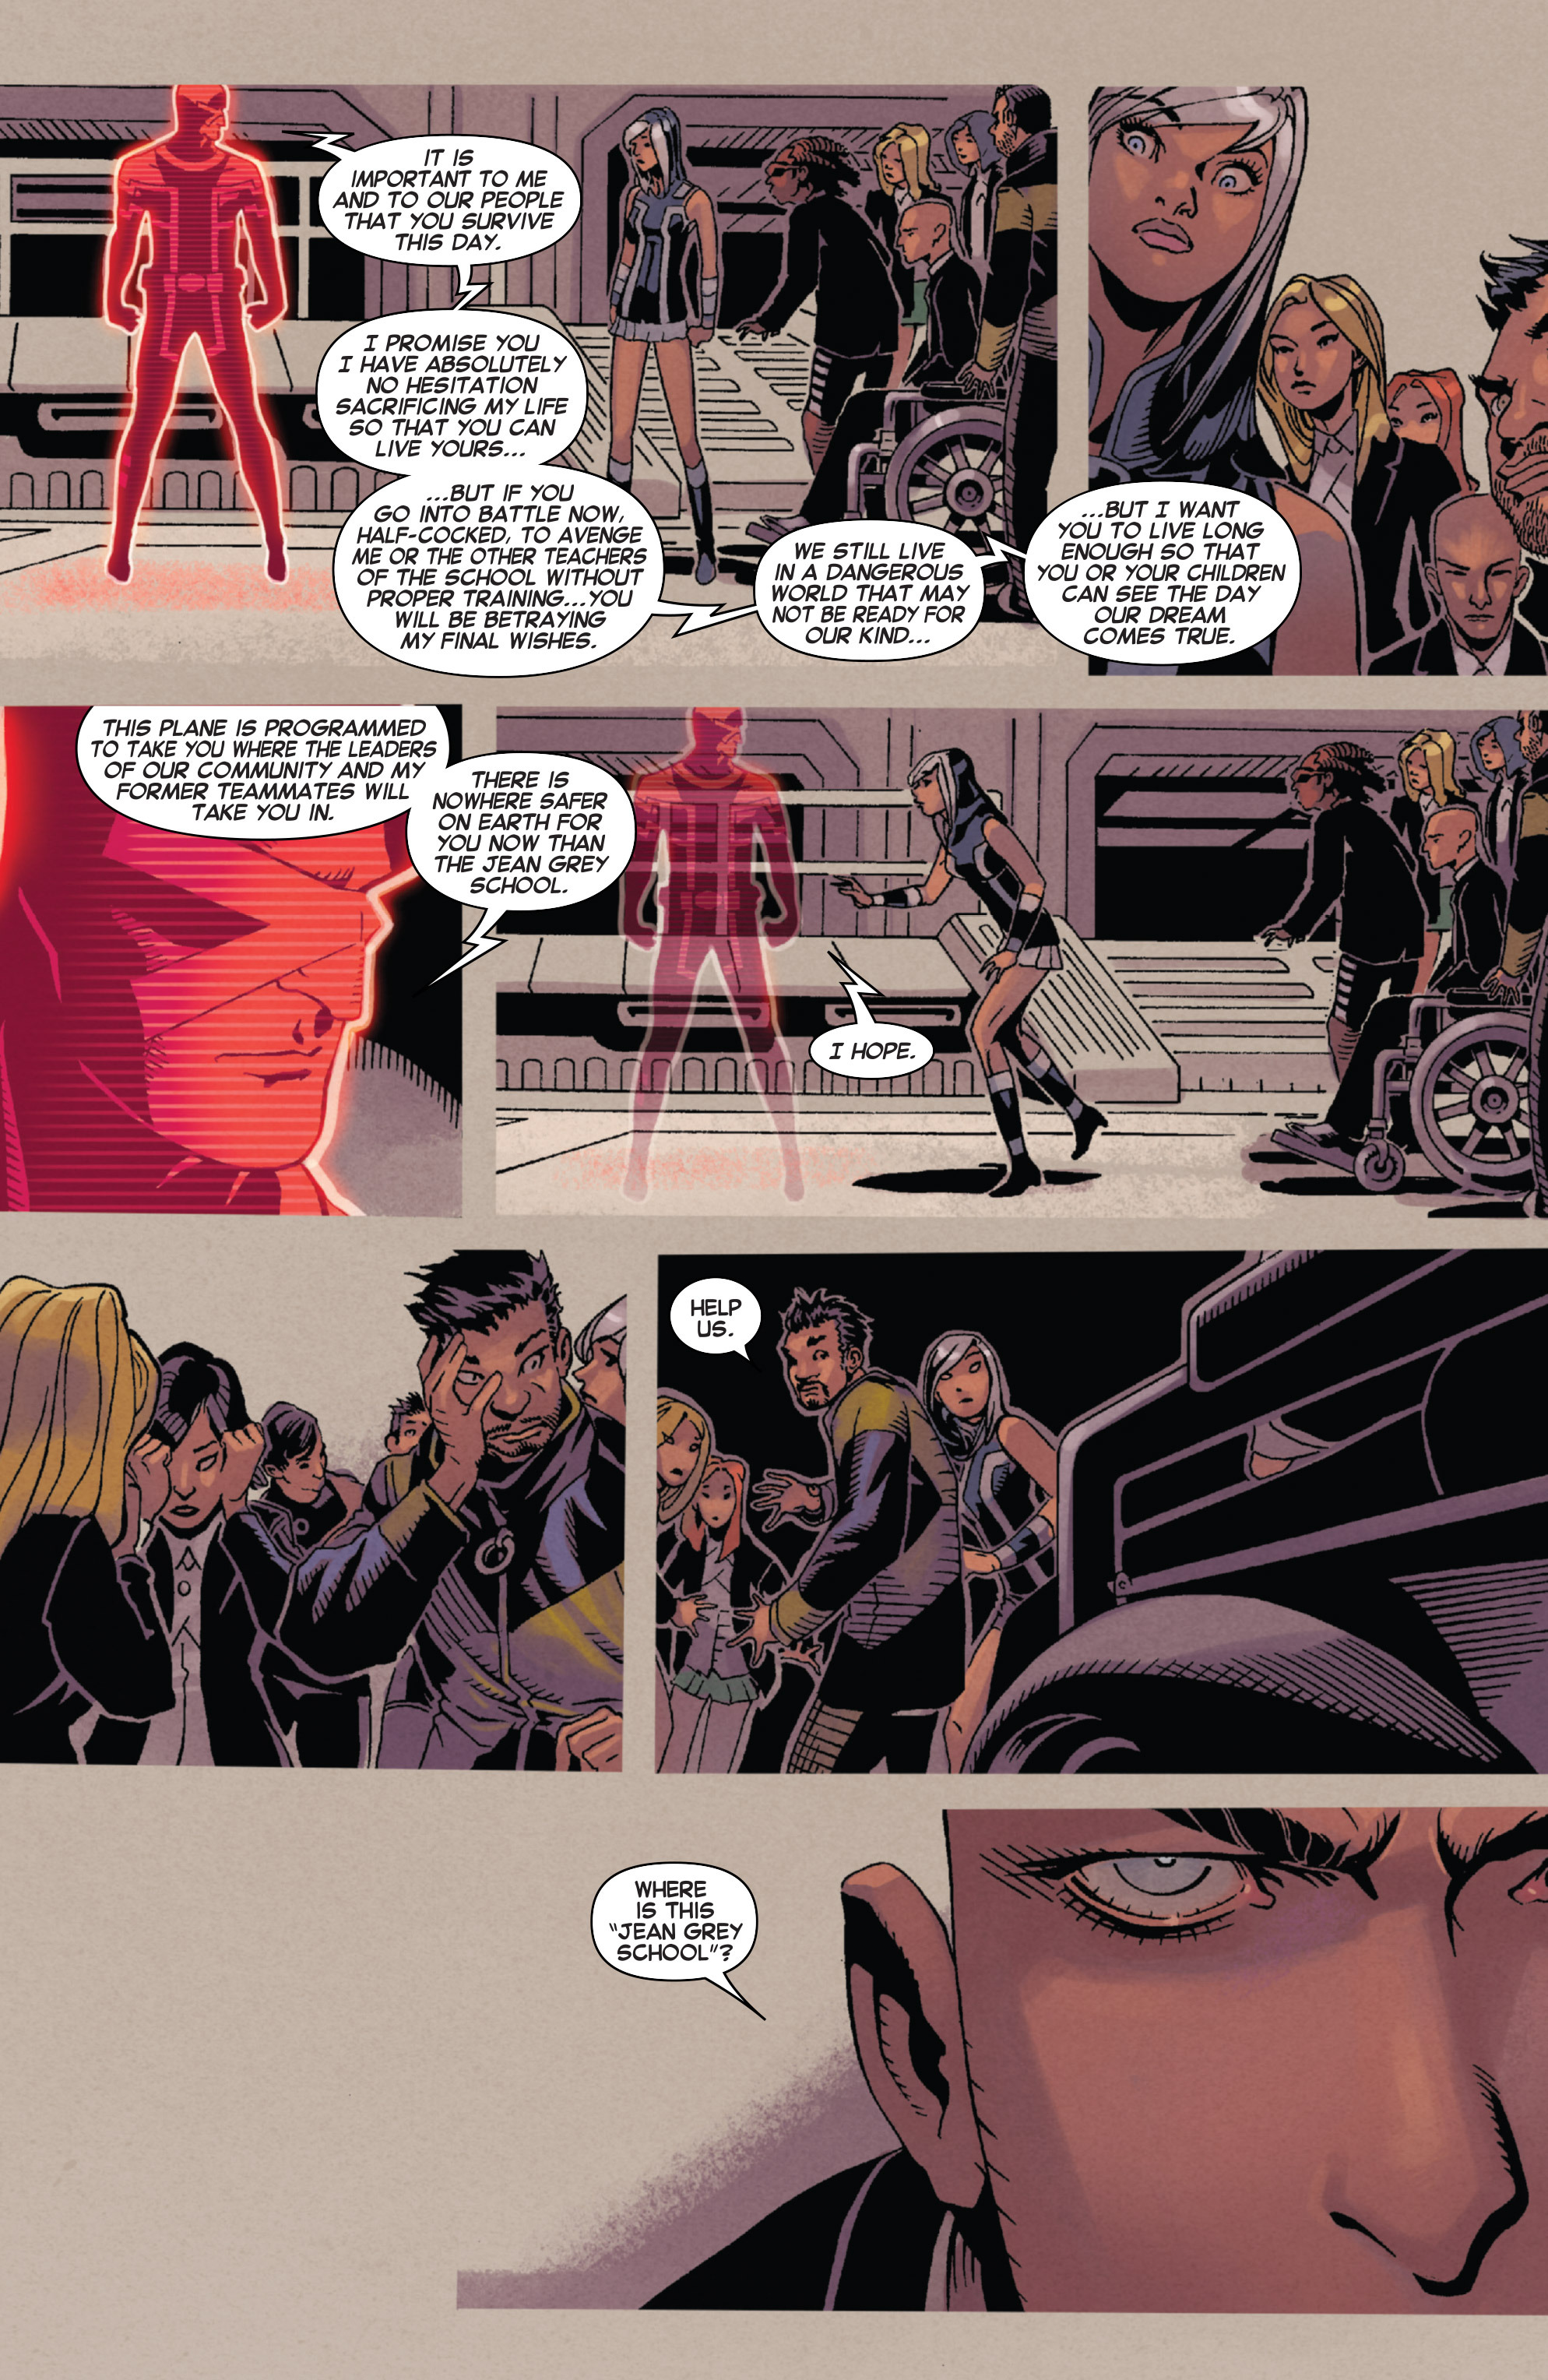 Read online Uncanny X-Men (2013) comic -  Issue # _TPB 5 - The Omega Mutant - 98